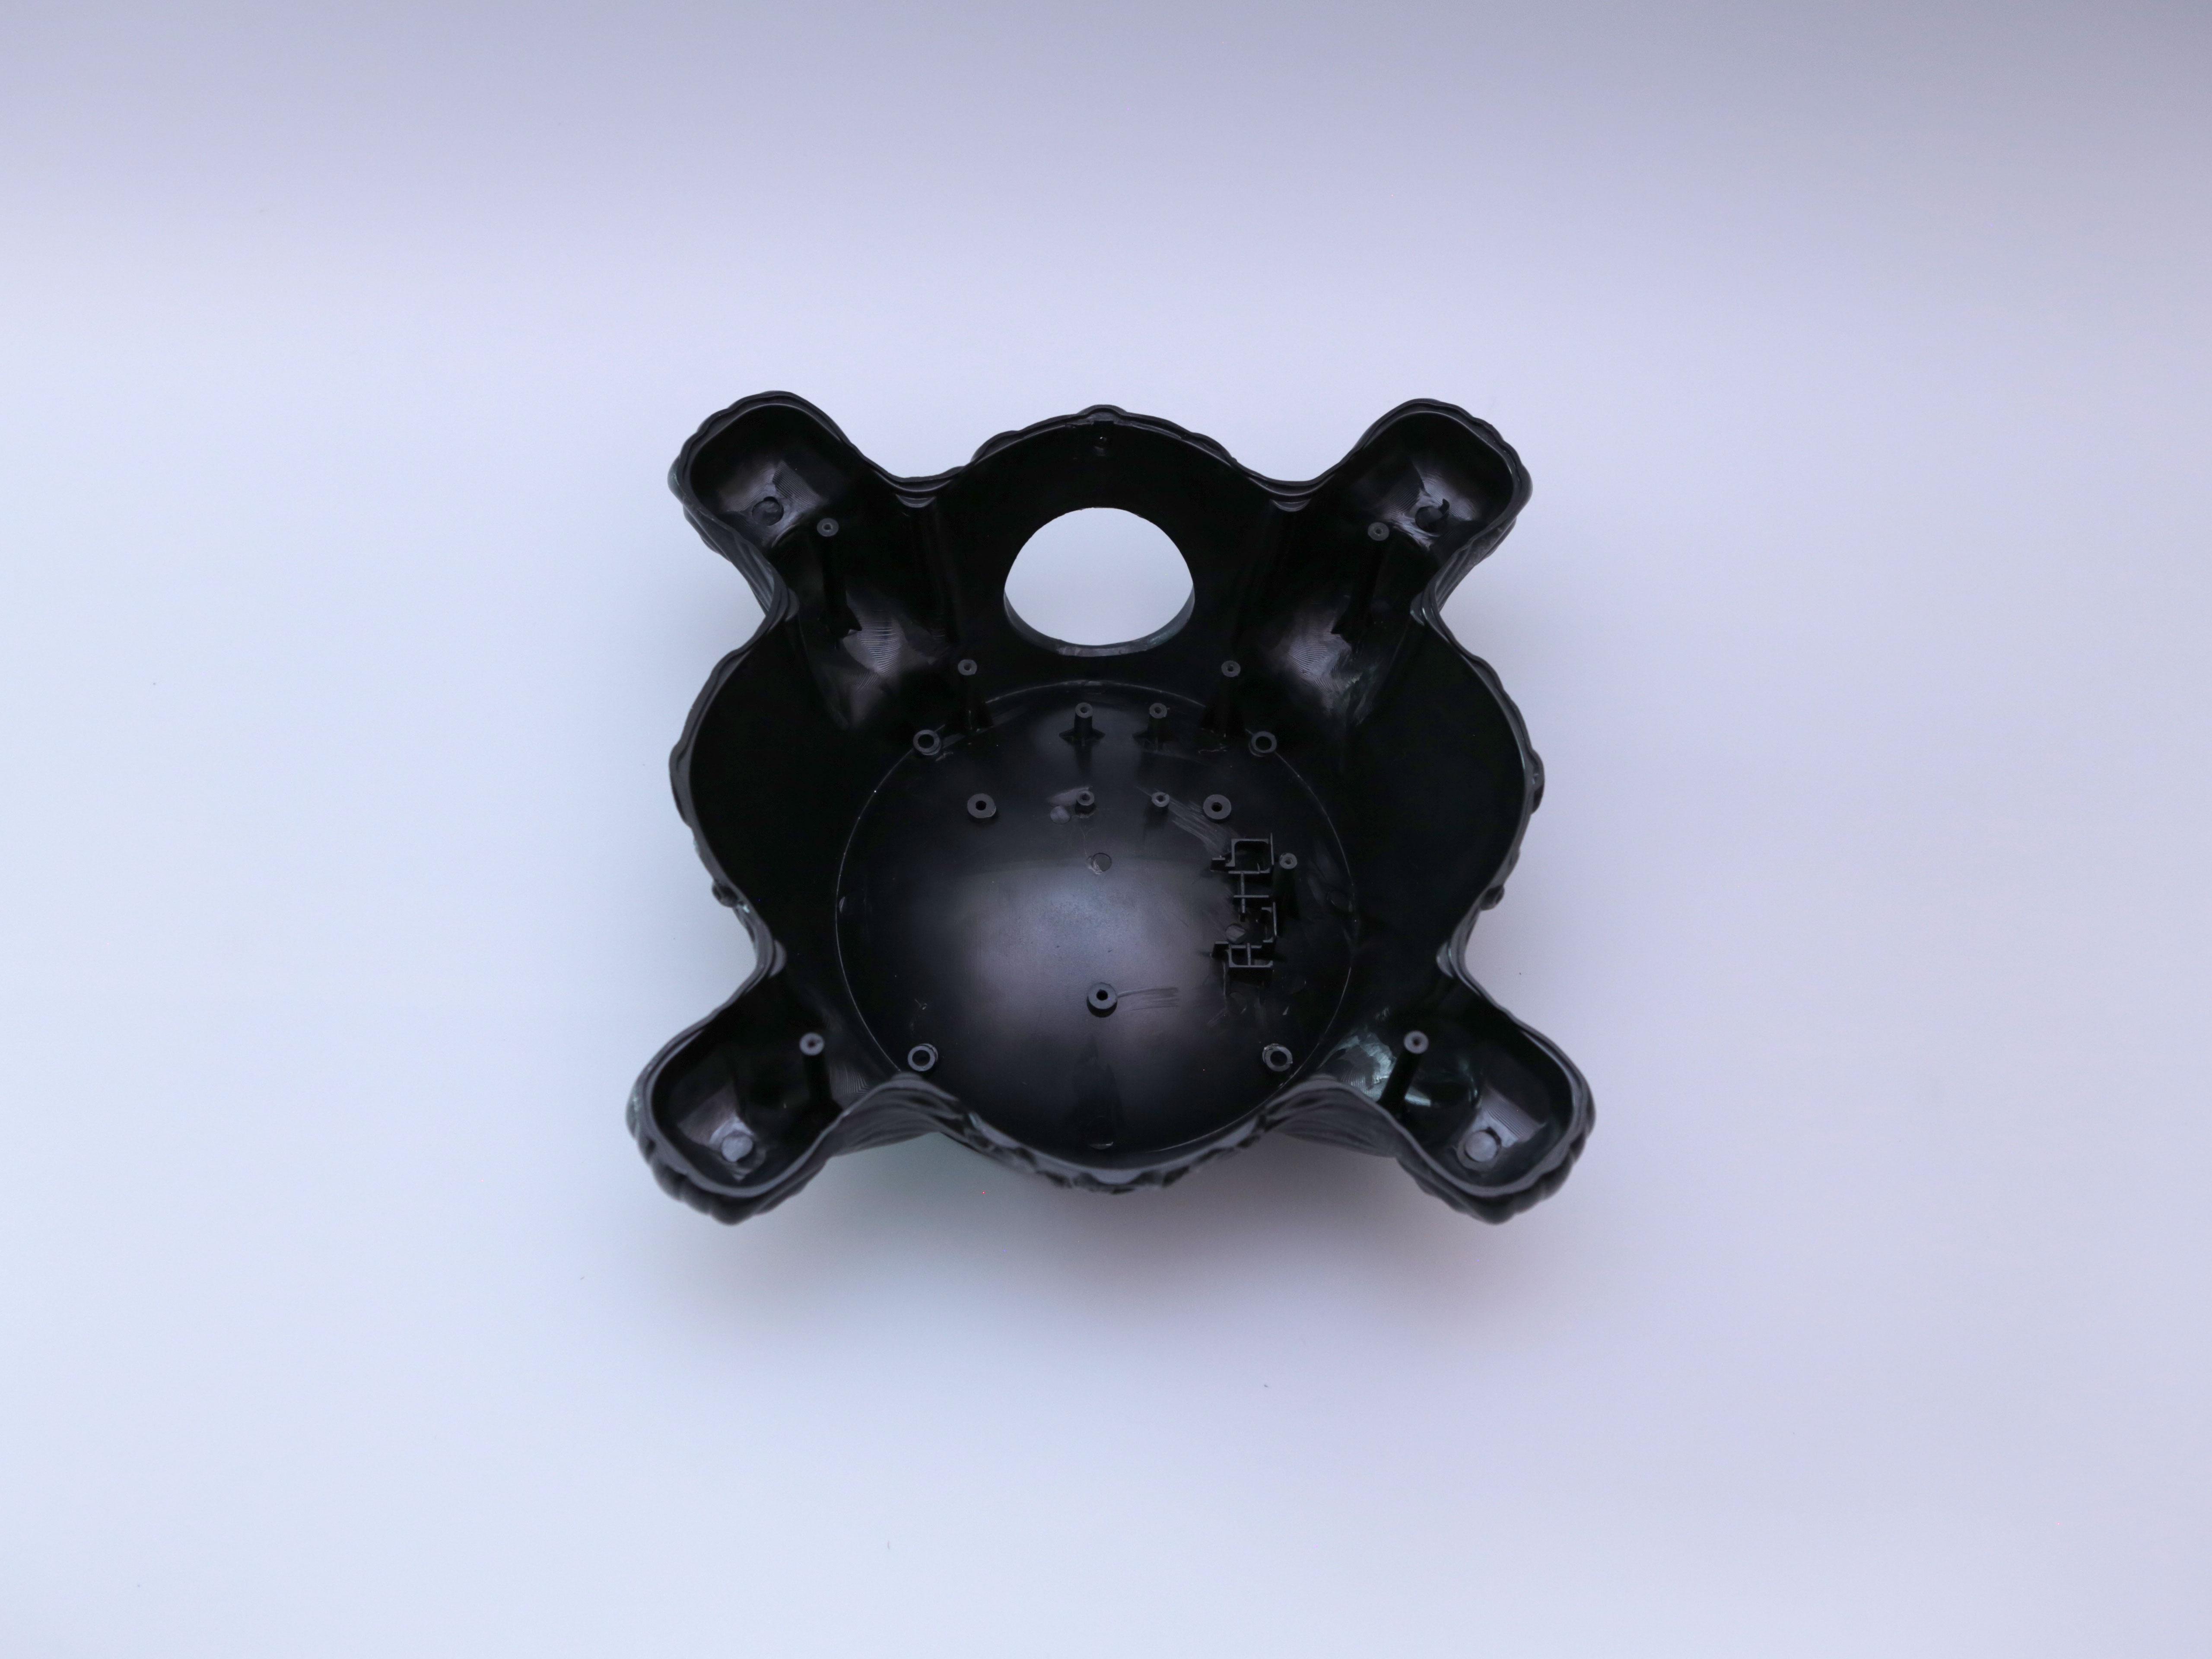 3d_printing_bowl-removed-inside.jpg